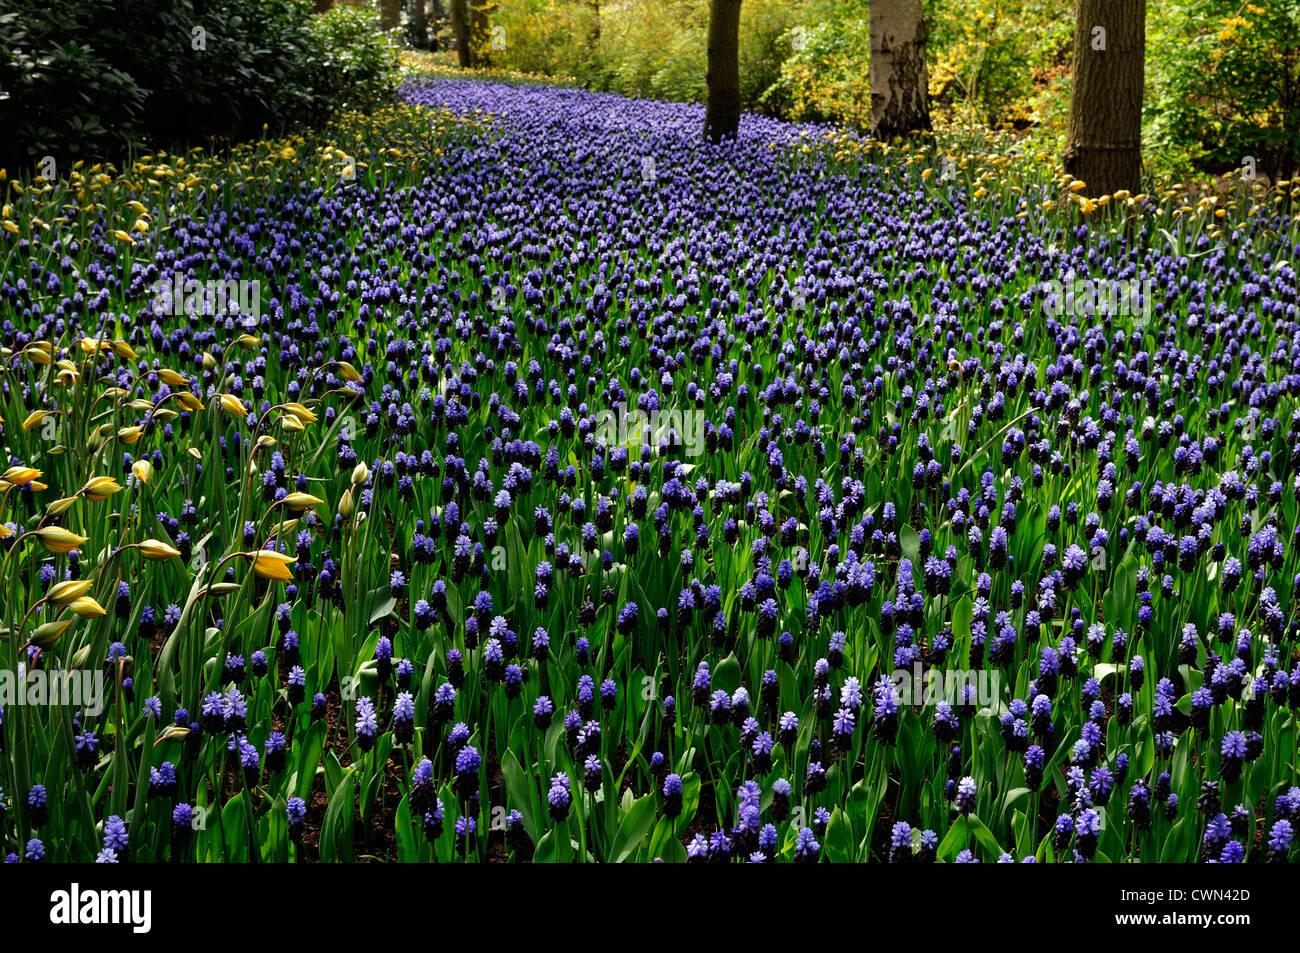 Muscari latifolium blue flowers tulipa sylvestris river effect bed spring bulb flowering bloom blossom bed display drift scheme Stock Photo